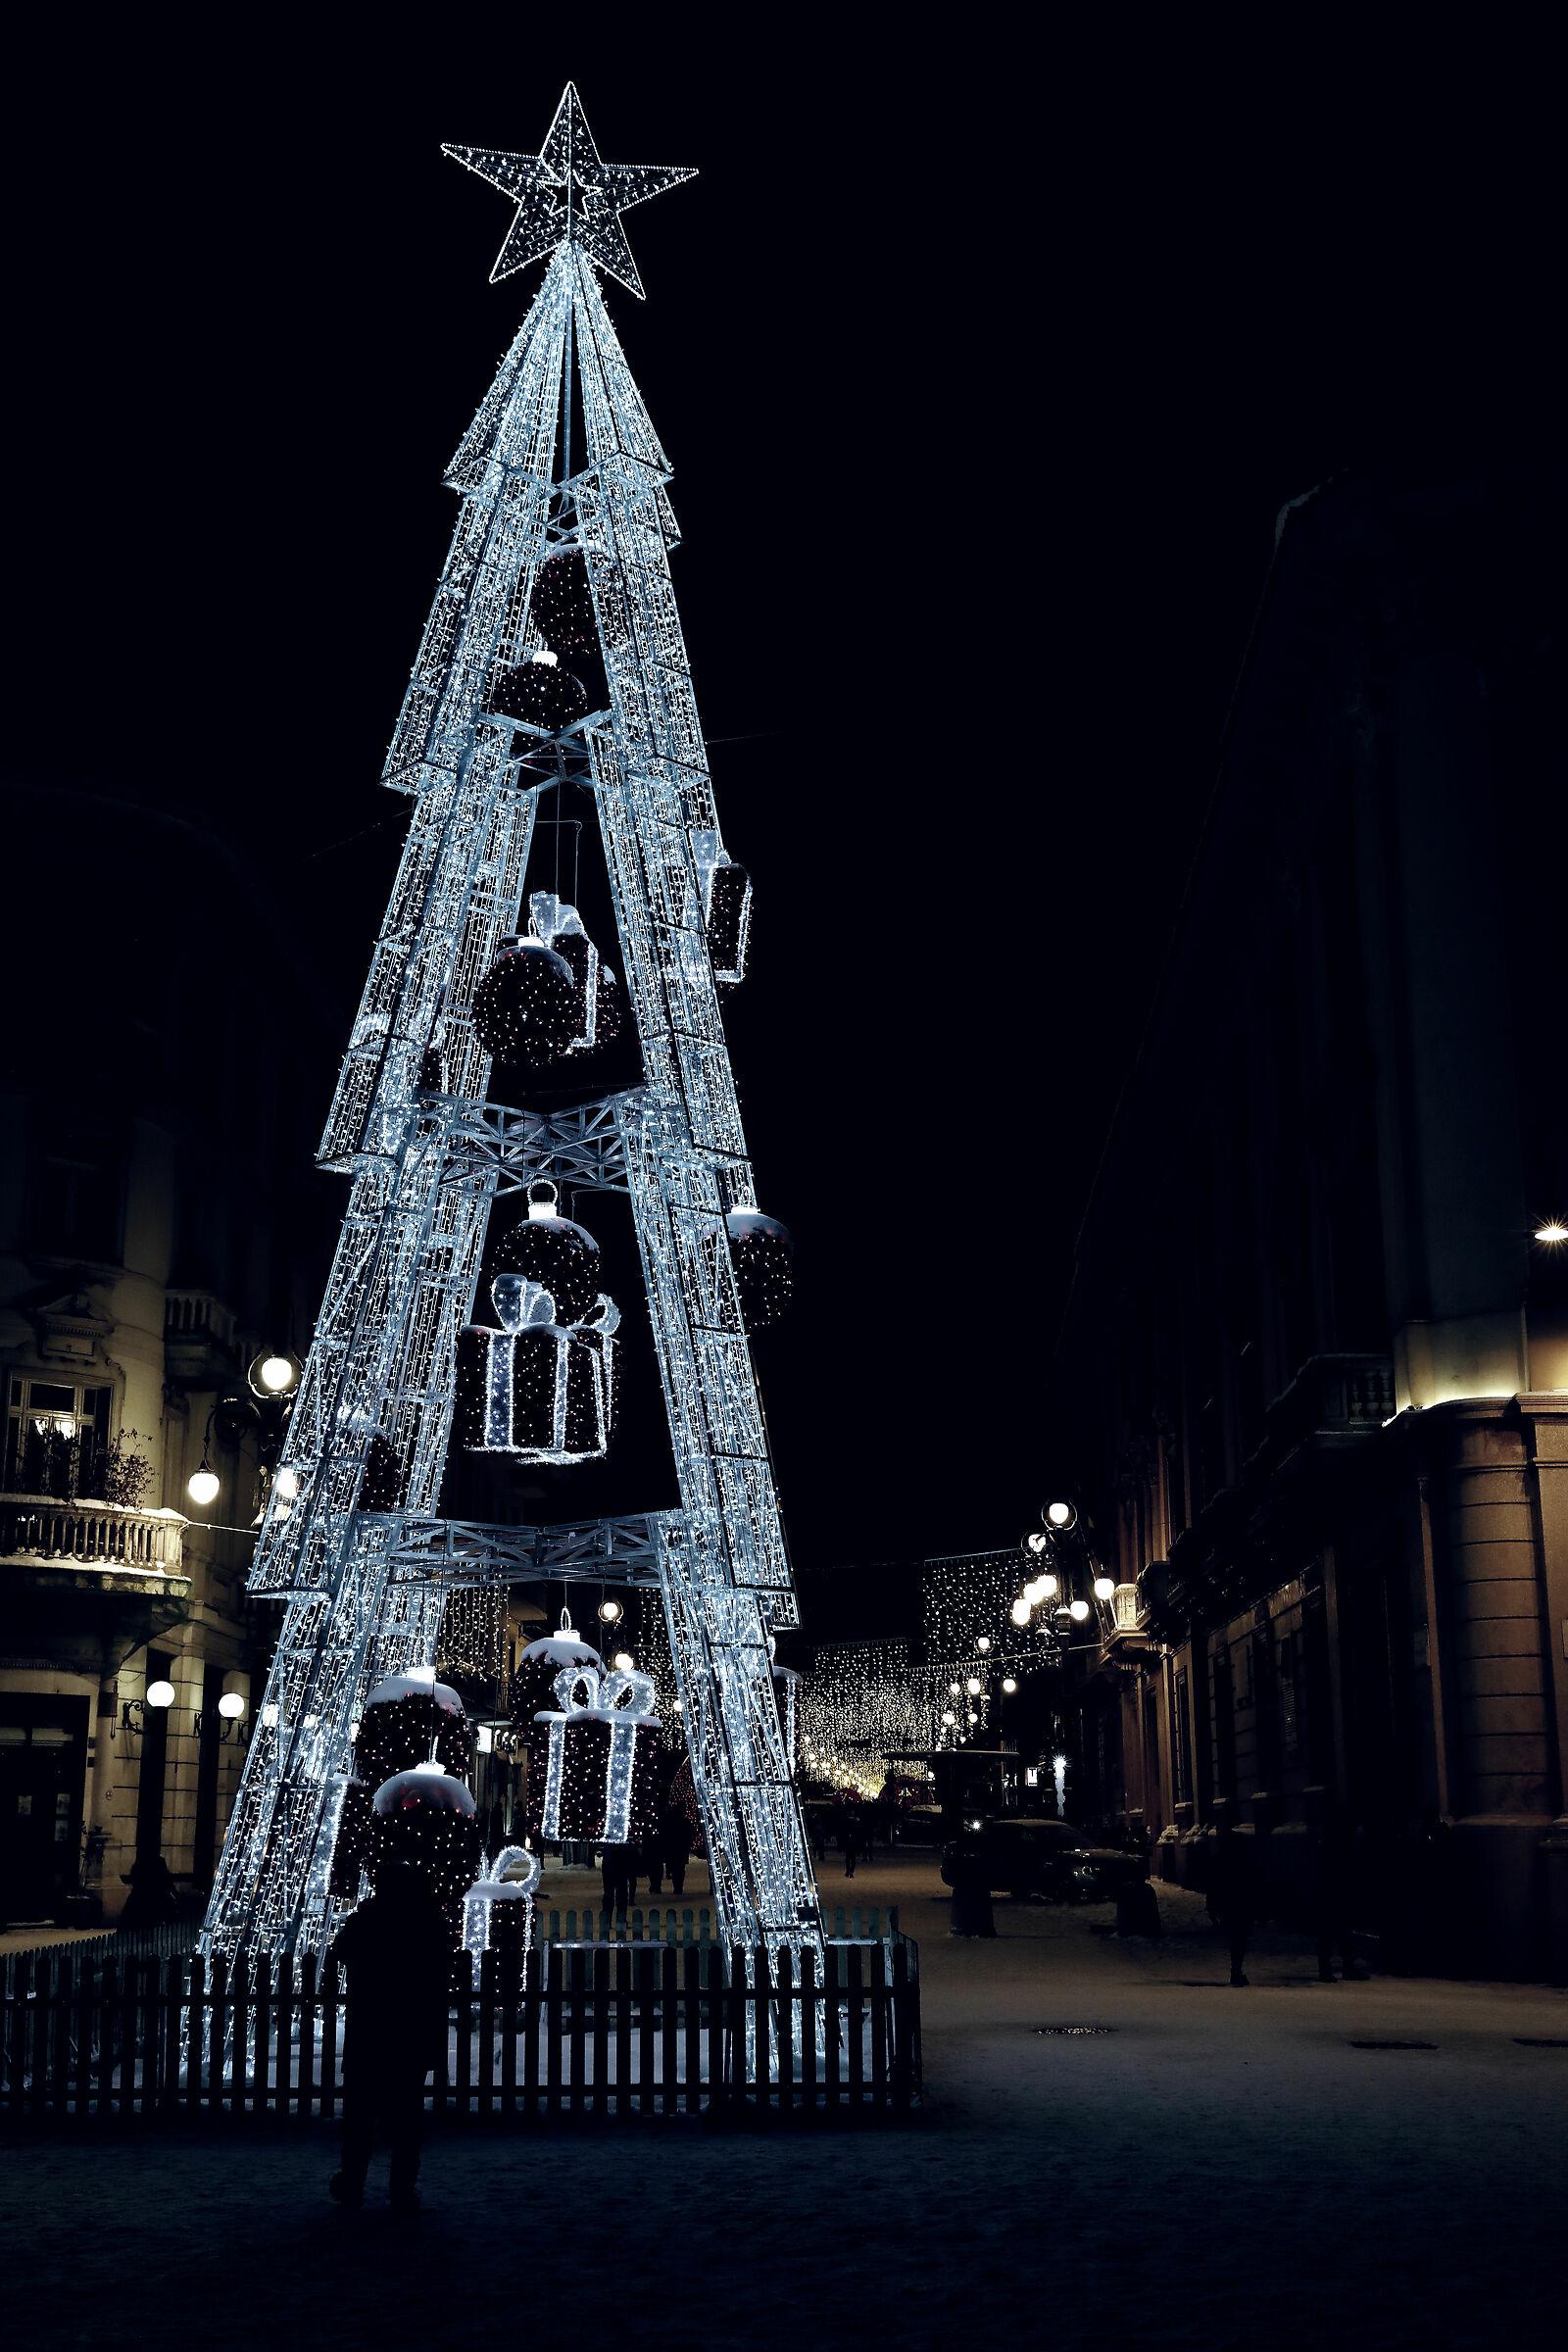 Christmas in Avellino...